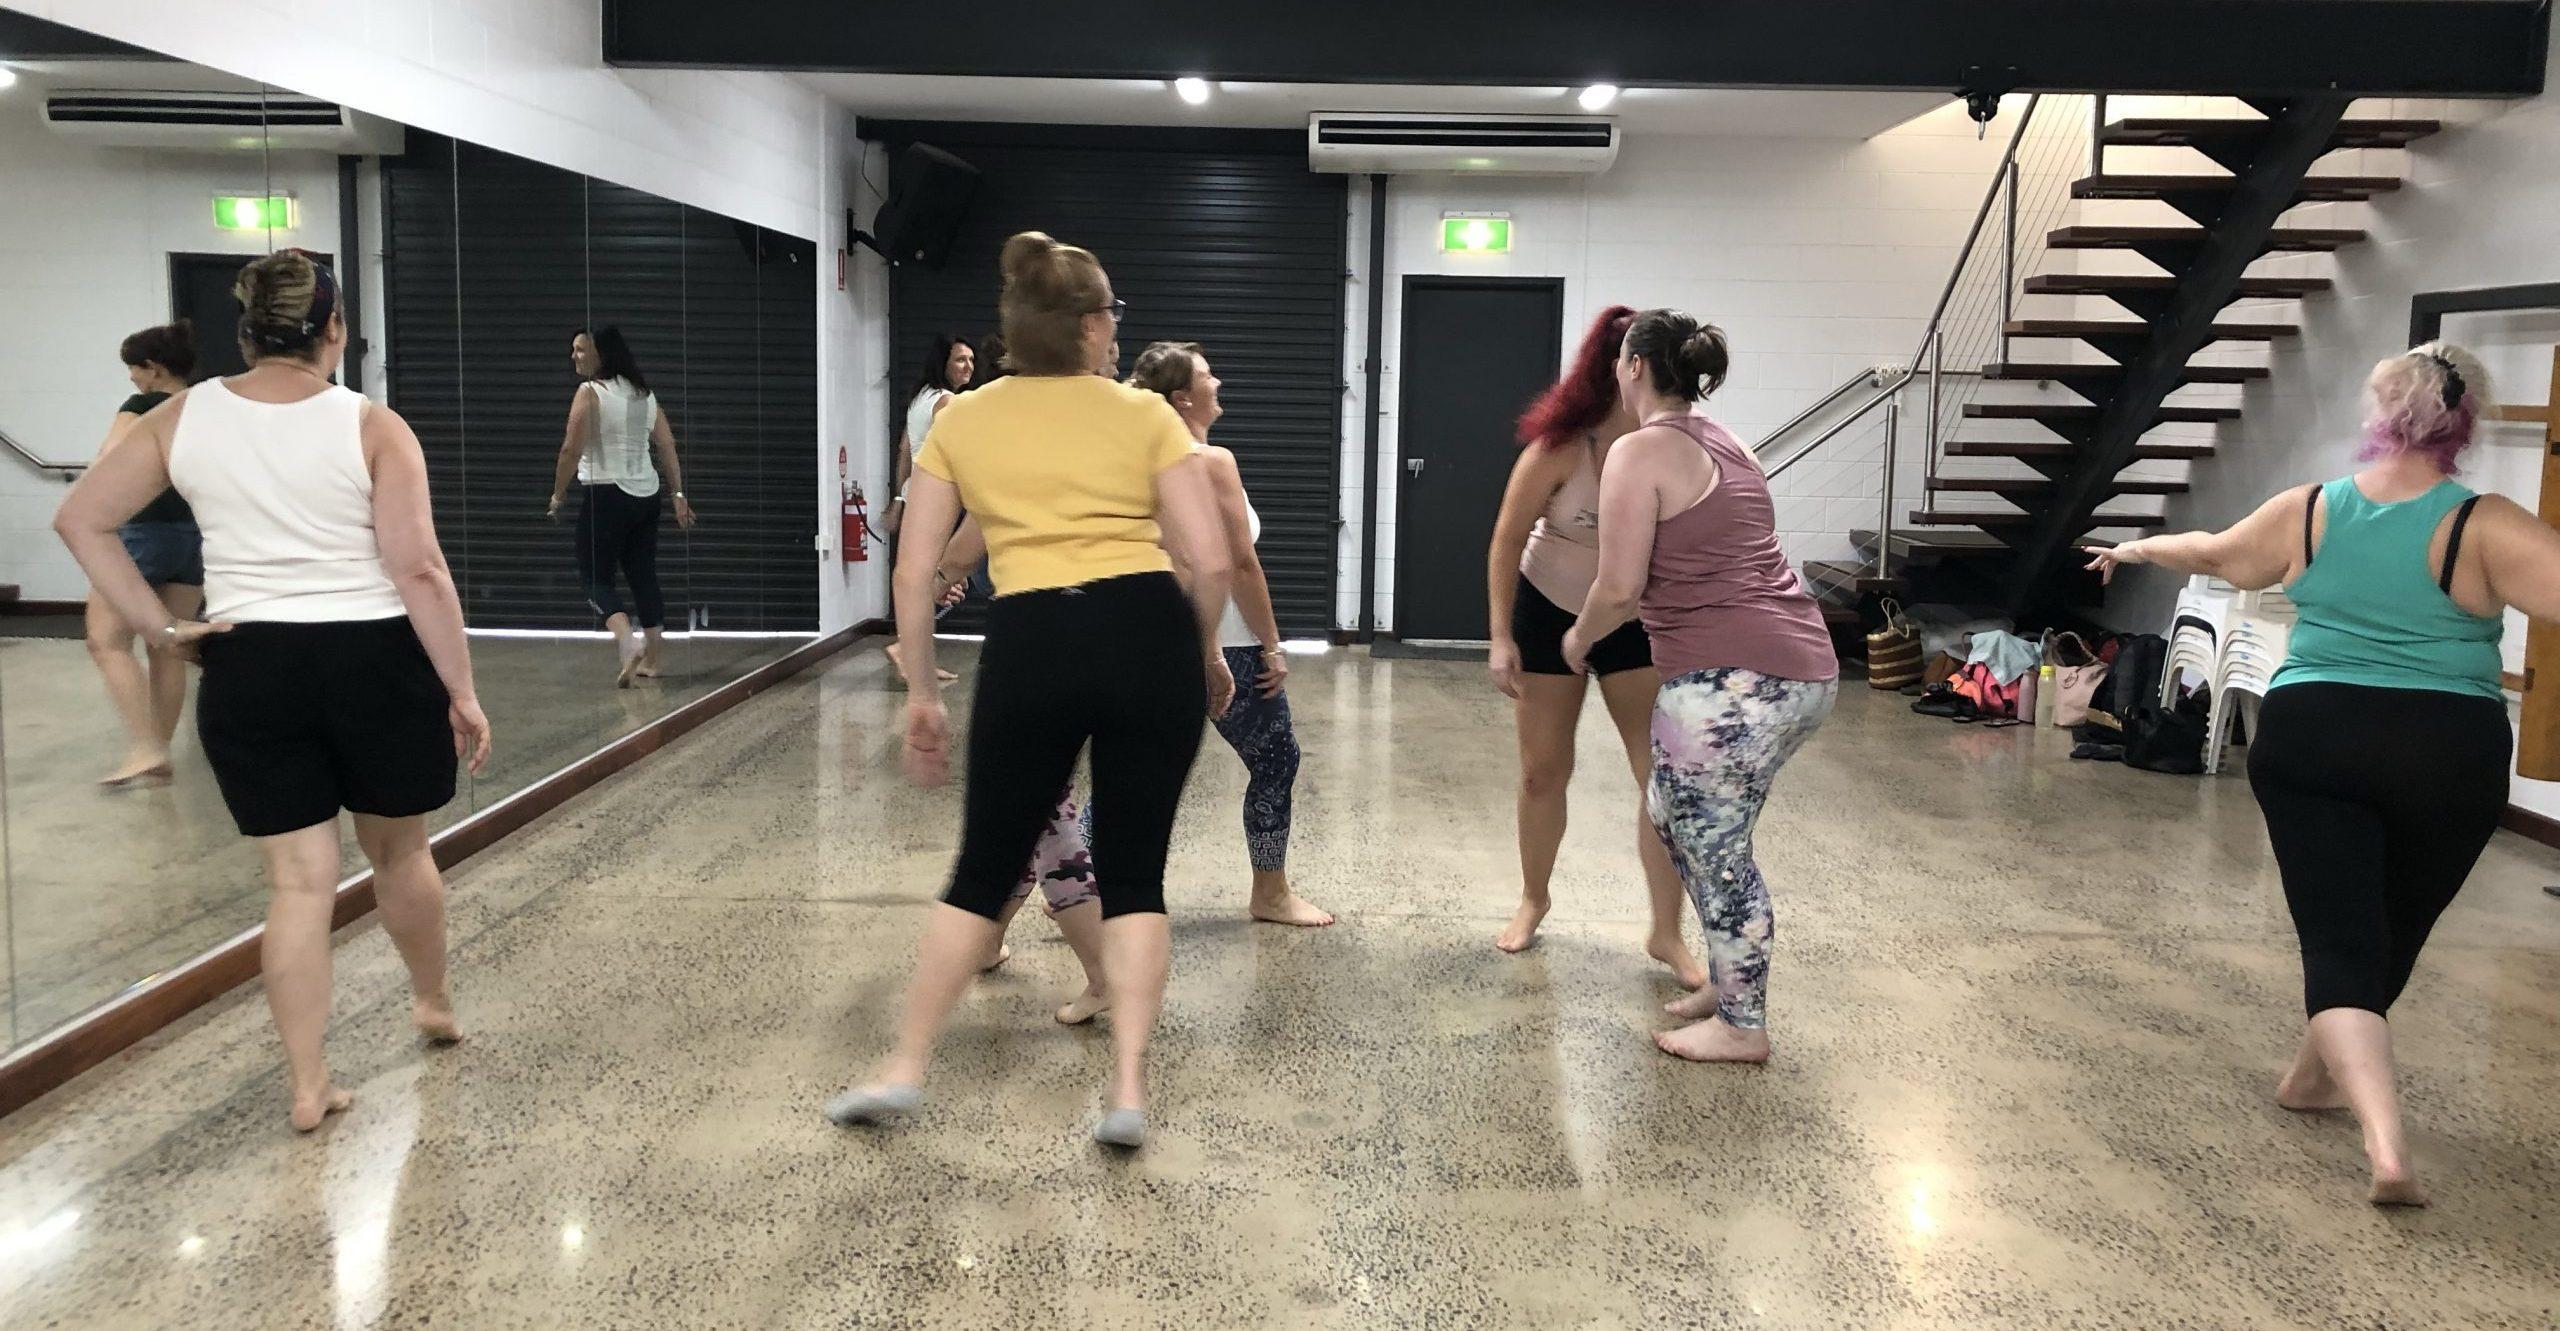 Burlesque dance class in Darwin